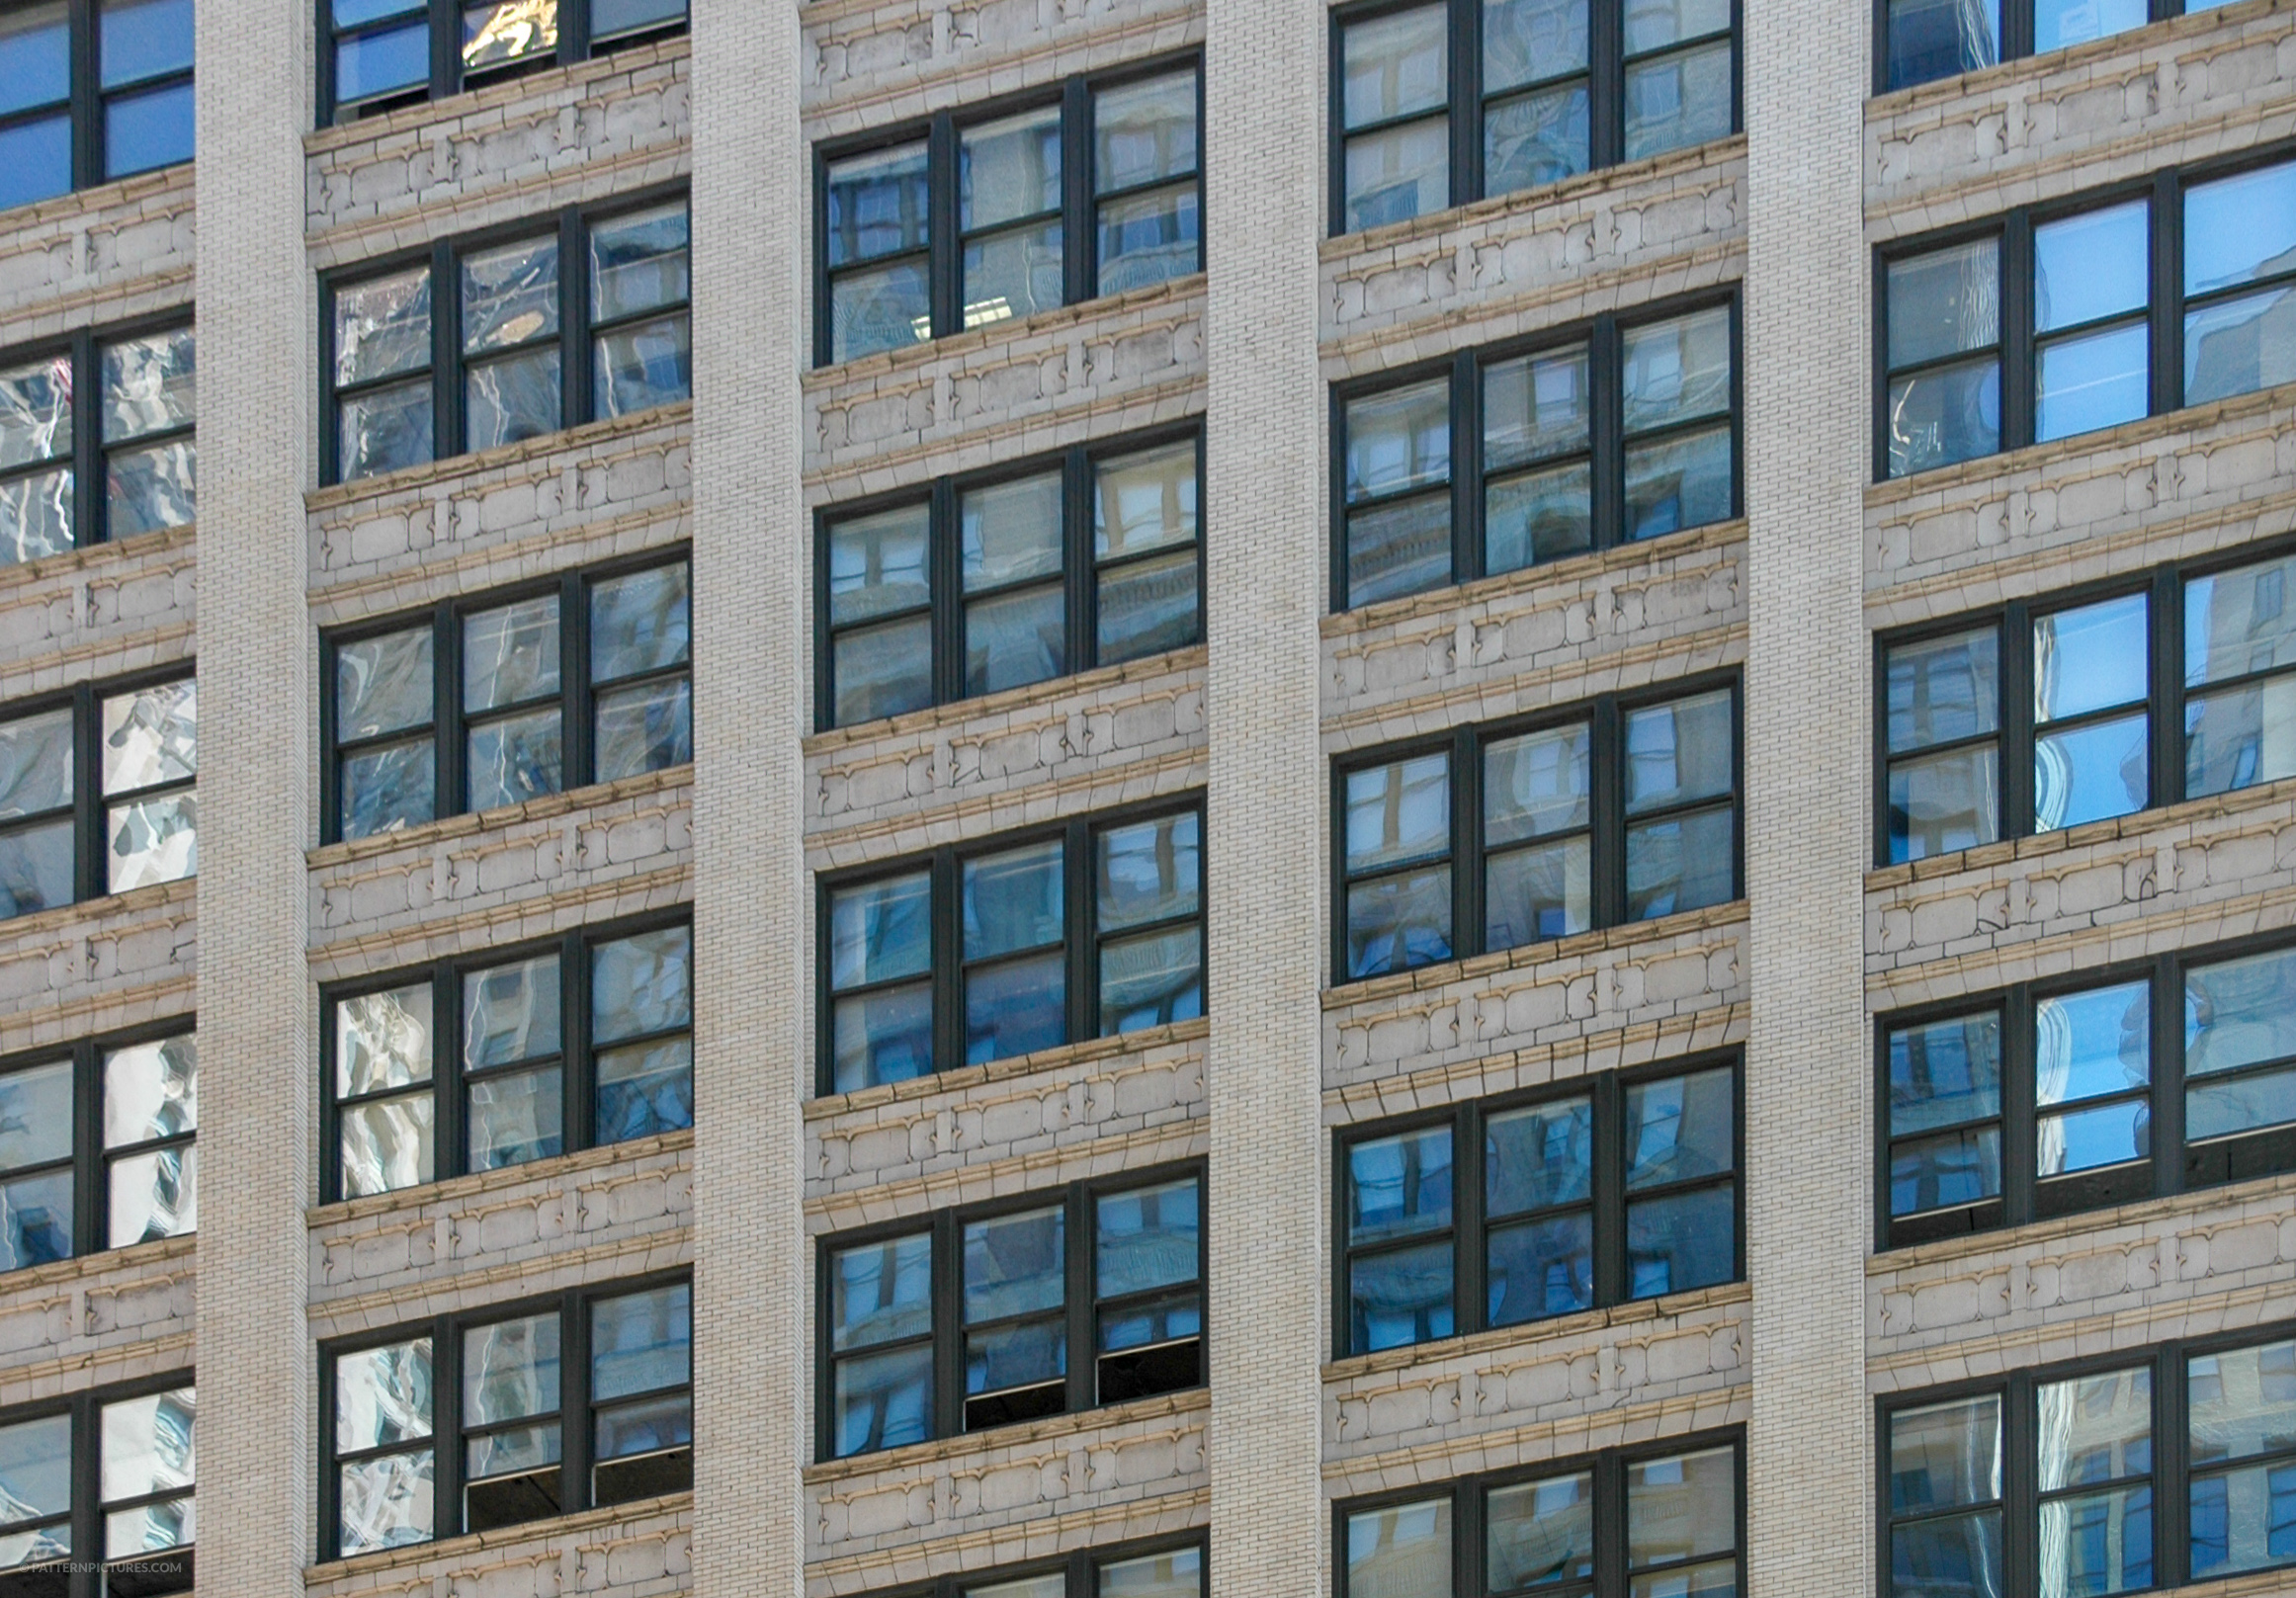 New York skyscraper repeating windows